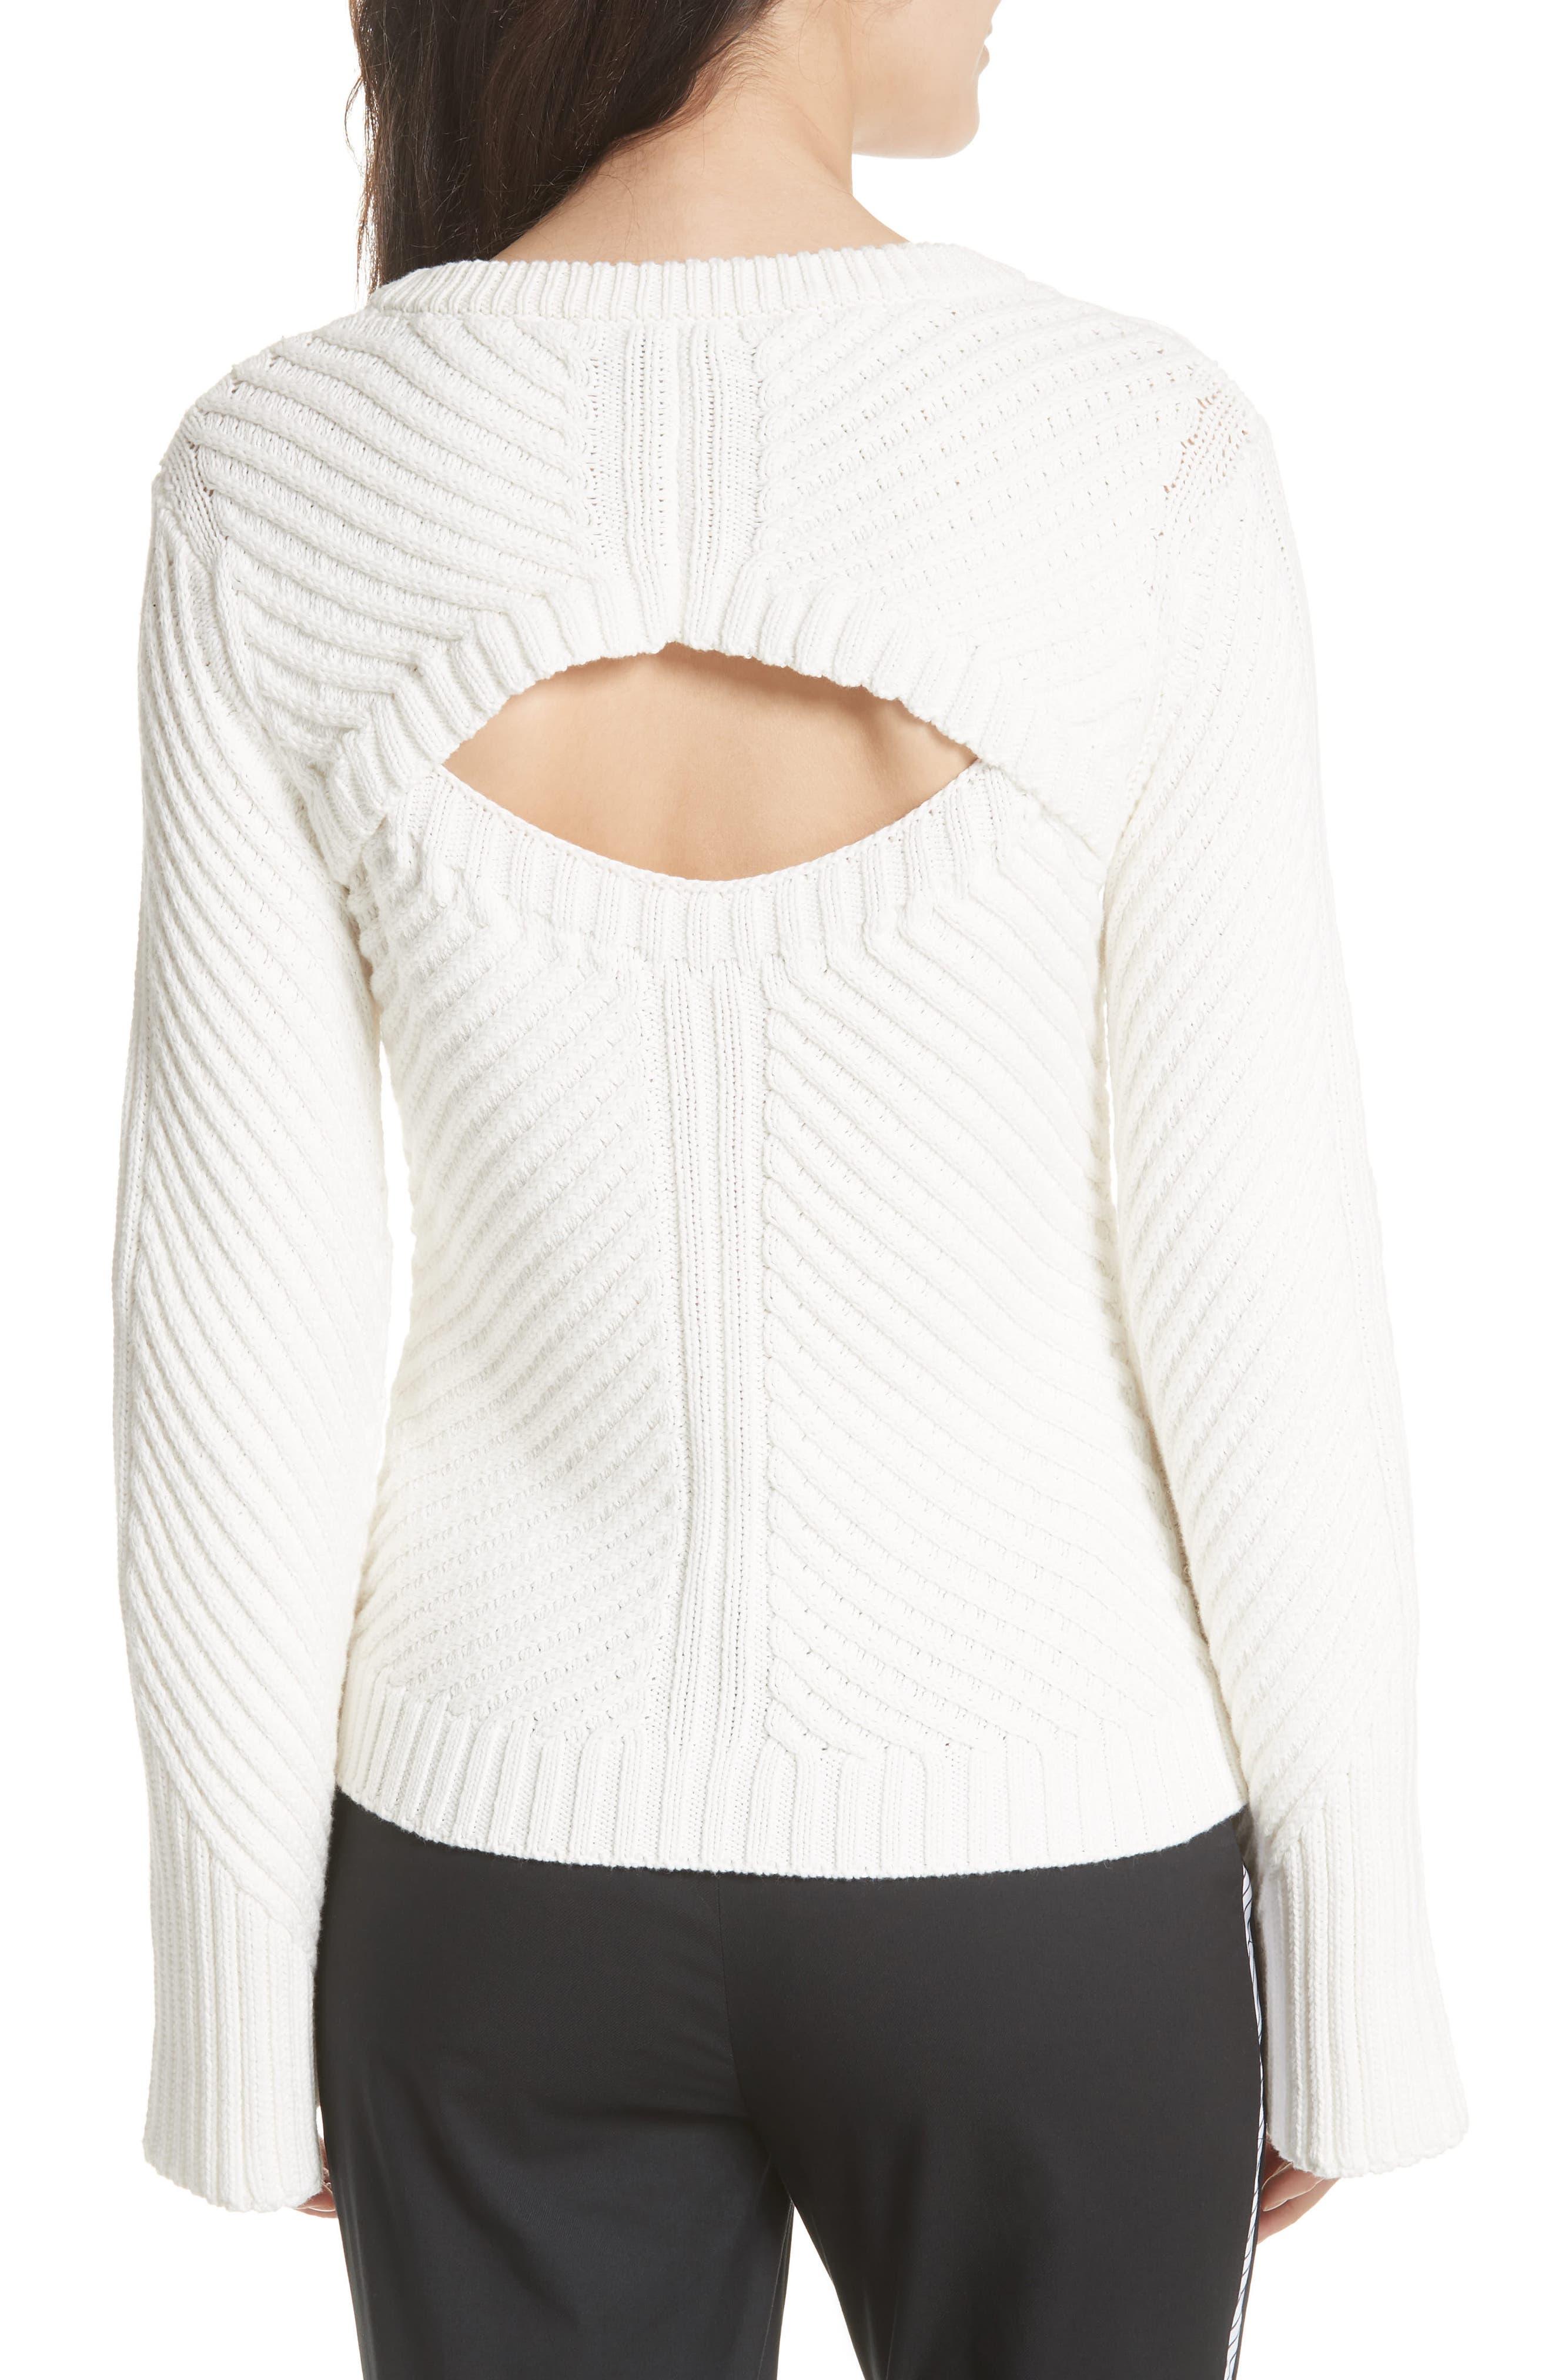 Lauraly Cutout Back Sweater,                             Alternate thumbnail 2, color,                             Porcelain